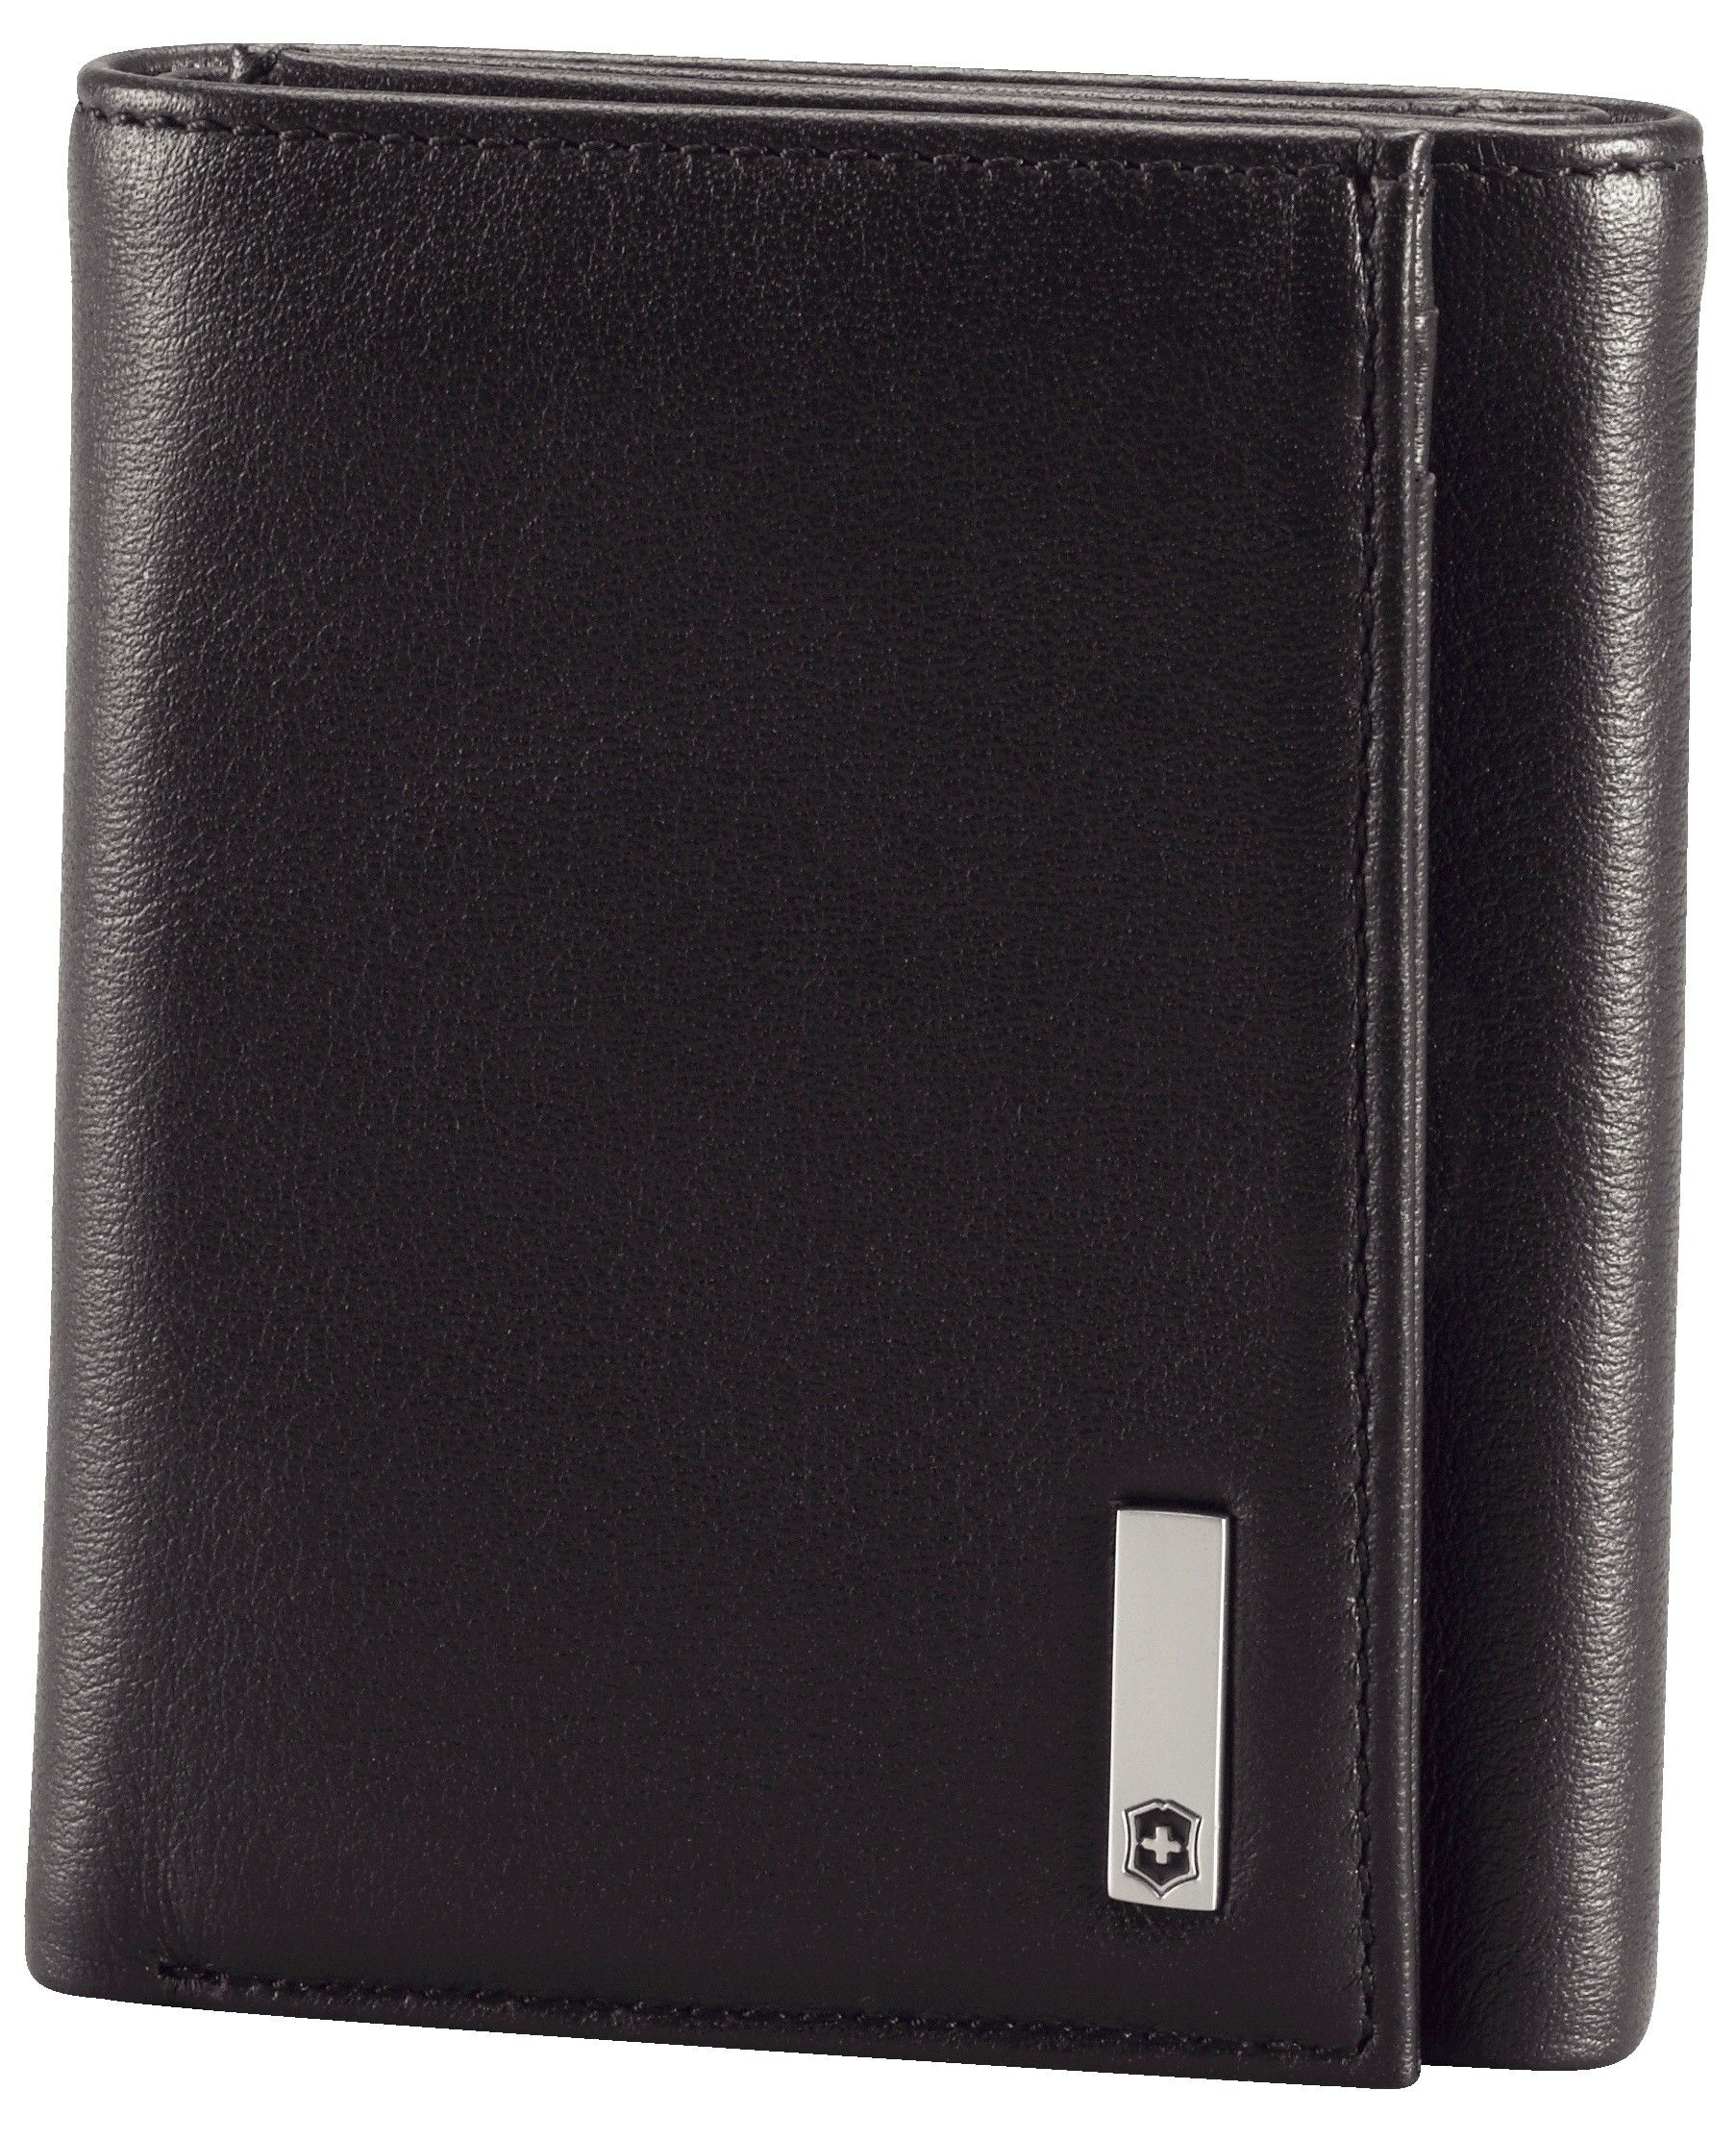 Victorinox Altius 3.0 Black Leather Athens Trifold Wallet